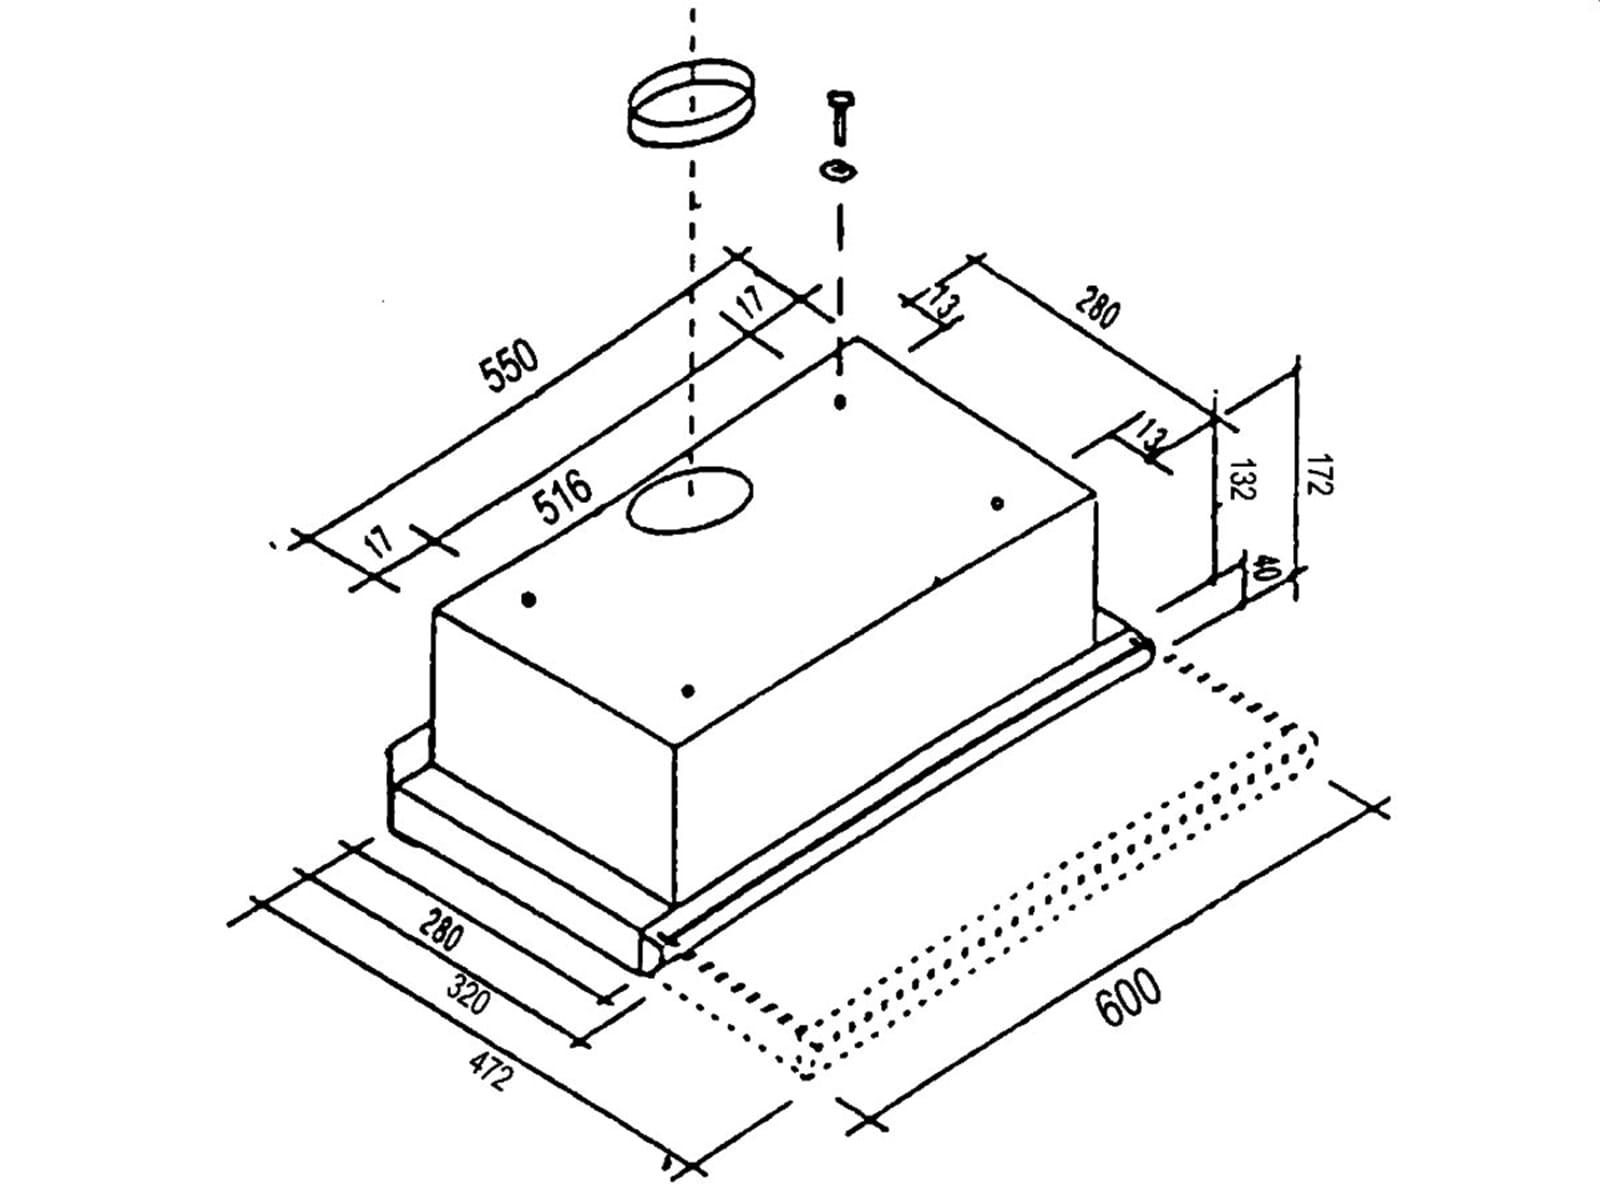 oranier fla 3 60 8839 04 flachschirm dunstabzug aluminium flachl fter umluft ebay. Black Bedroom Furniture Sets. Home Design Ideas